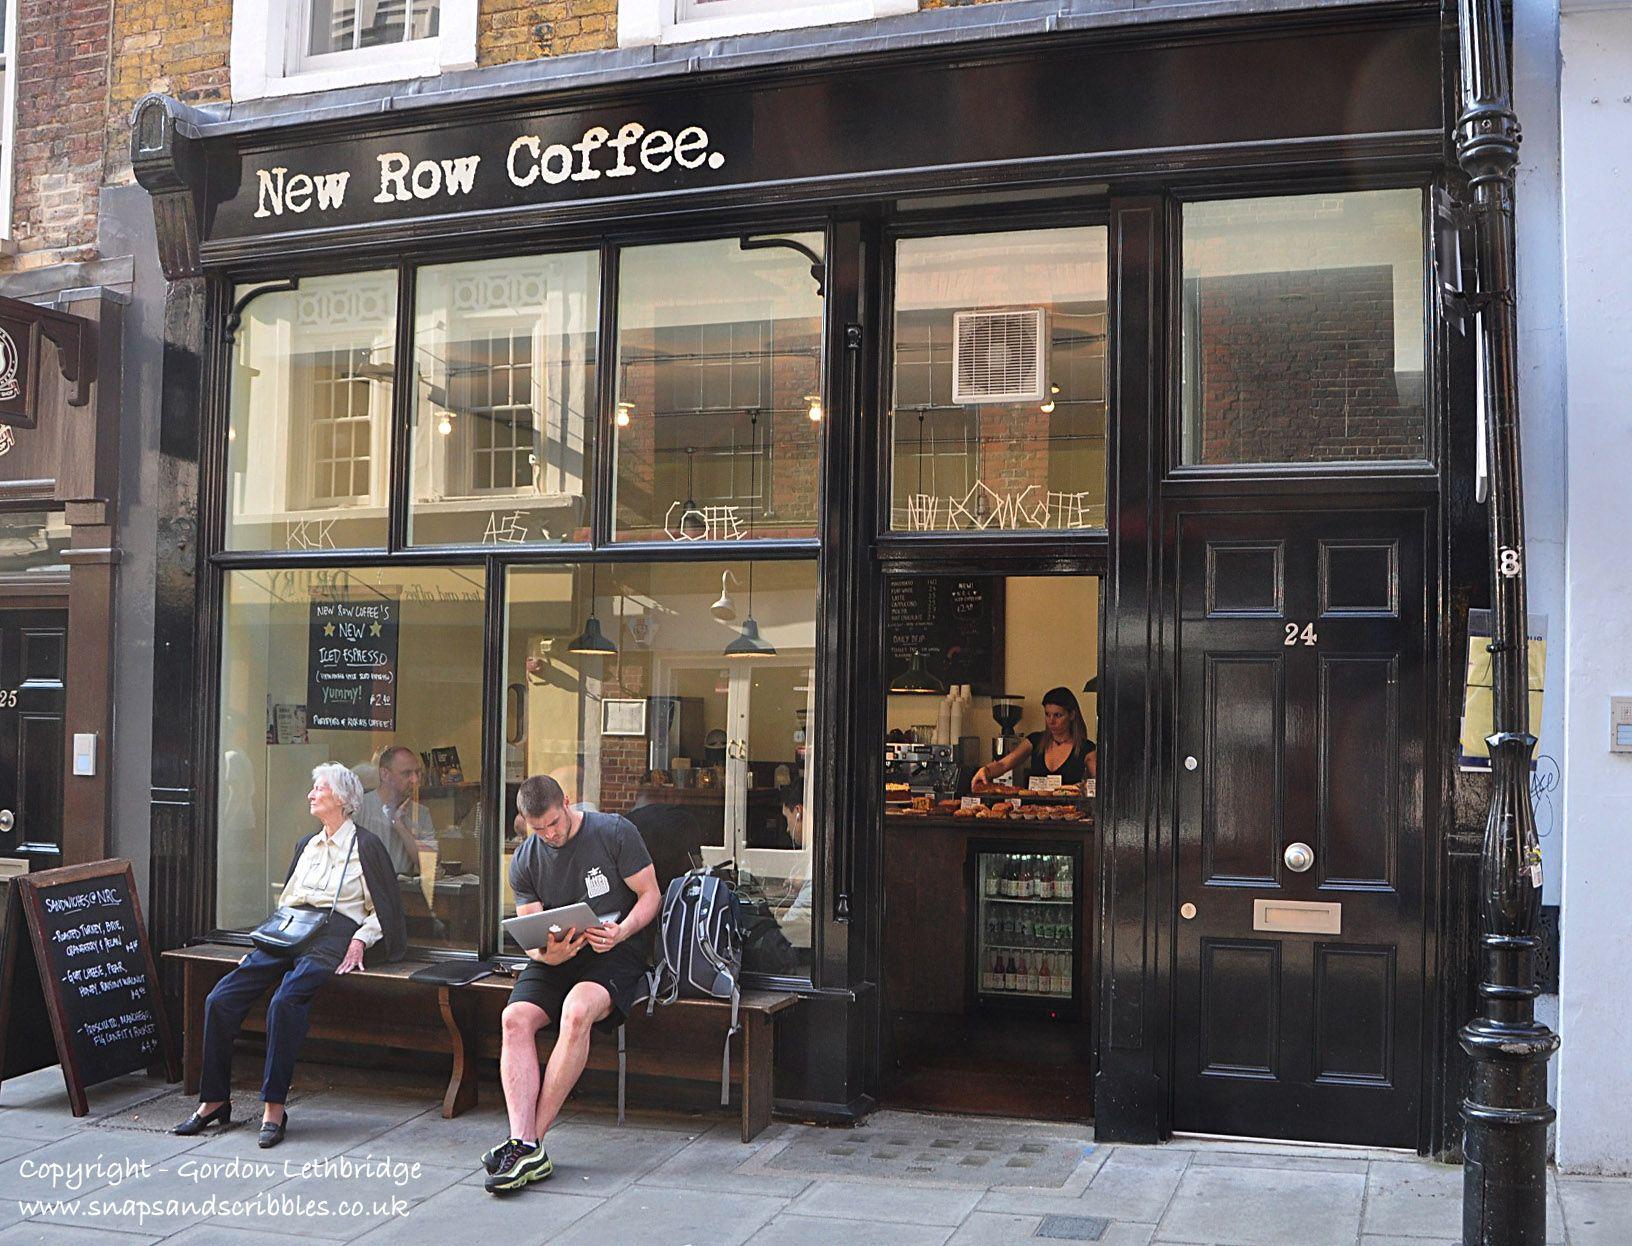 New Row Coffee, Covent Garden